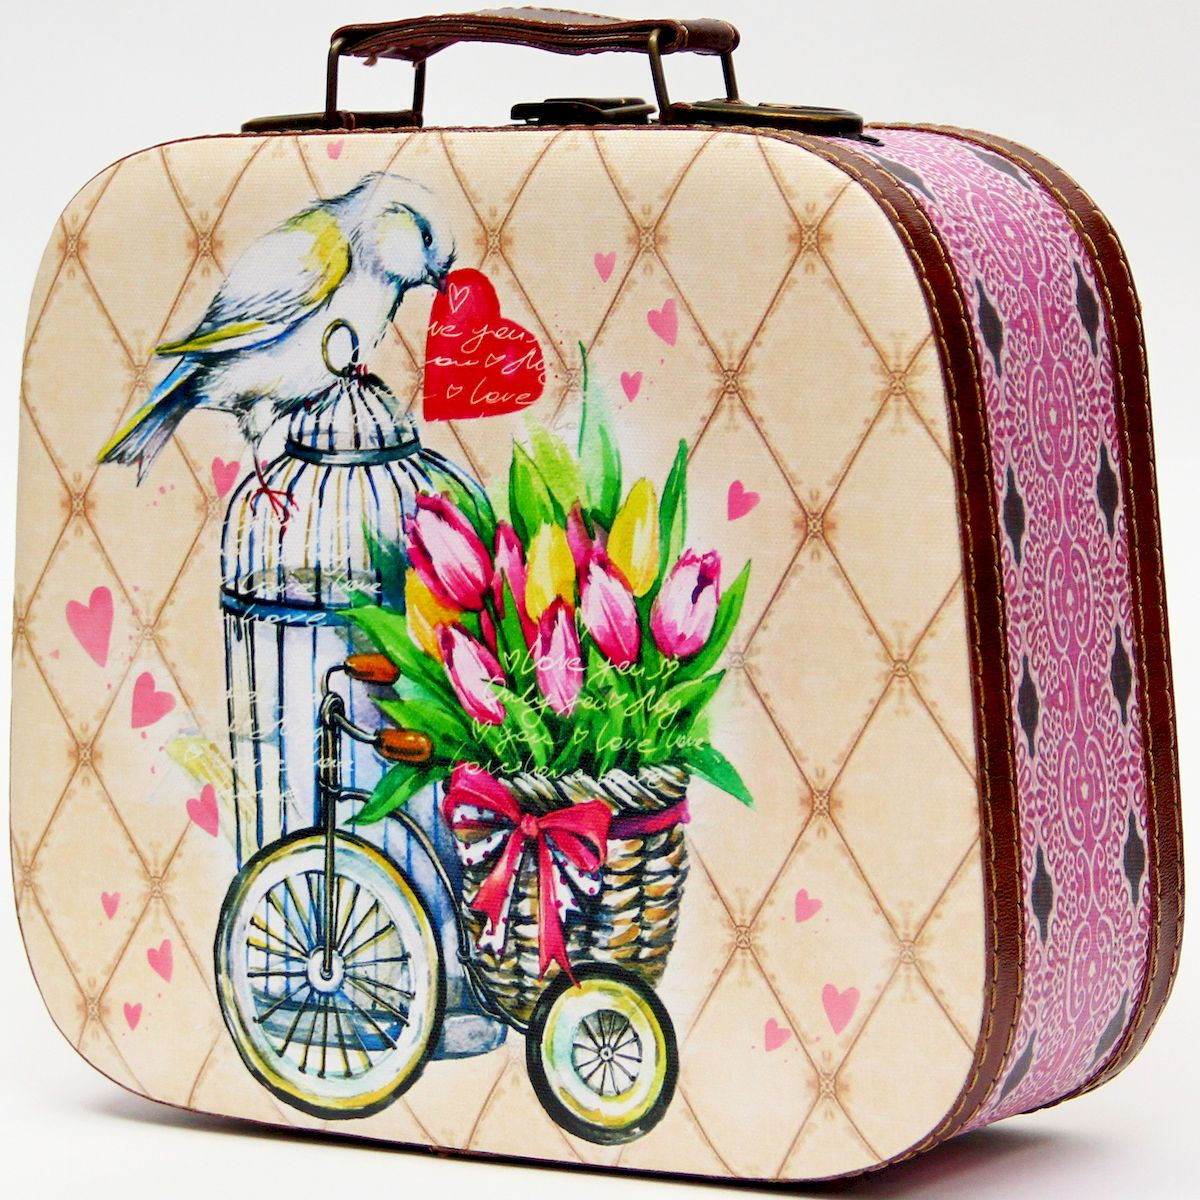 Шкатулка декоративная Magic Home Летнее настроение, цвет: бежевый, 25 х 20,5 х 9 см шкатулки magic home шкатулка дождь в париже